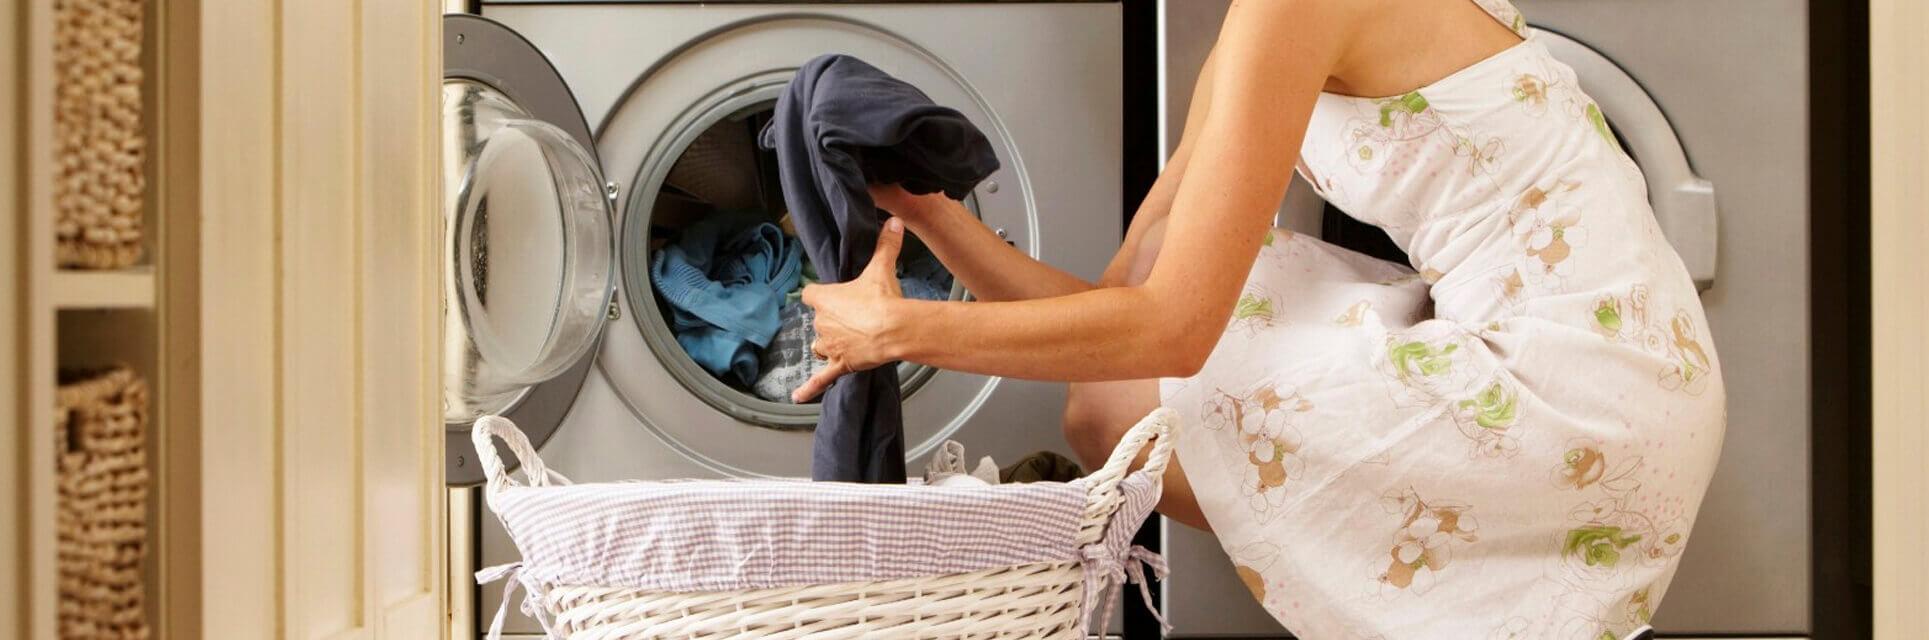 Servicio técnico lavadoras aeg